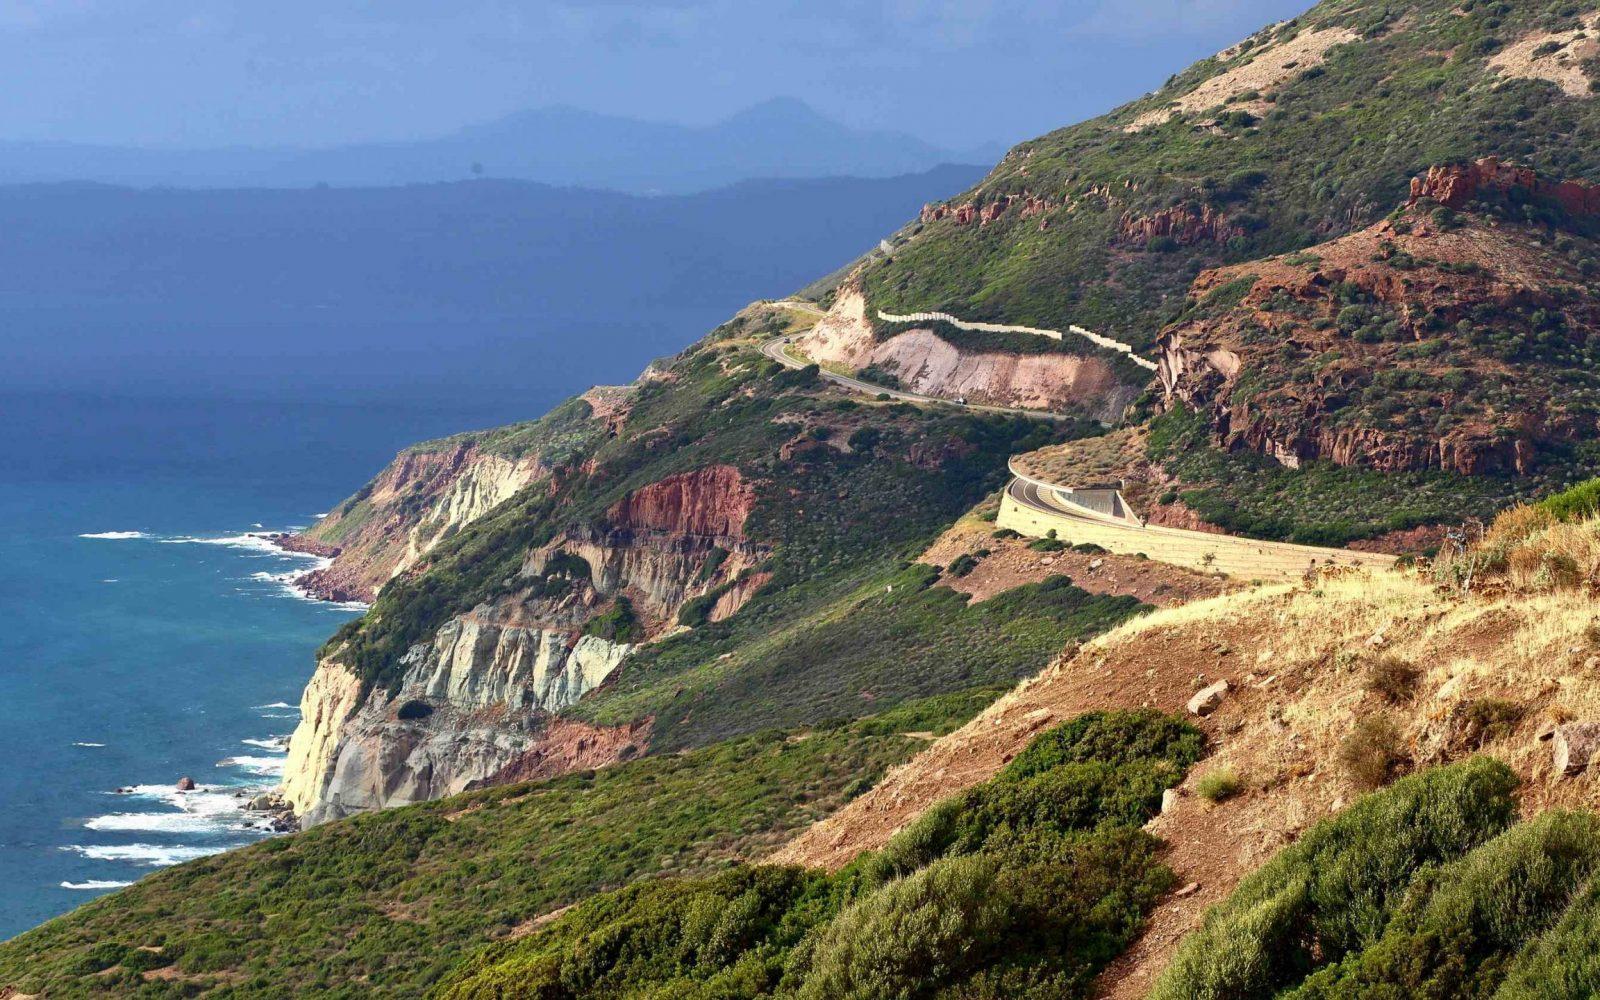 Na severovzhodu Sardinije